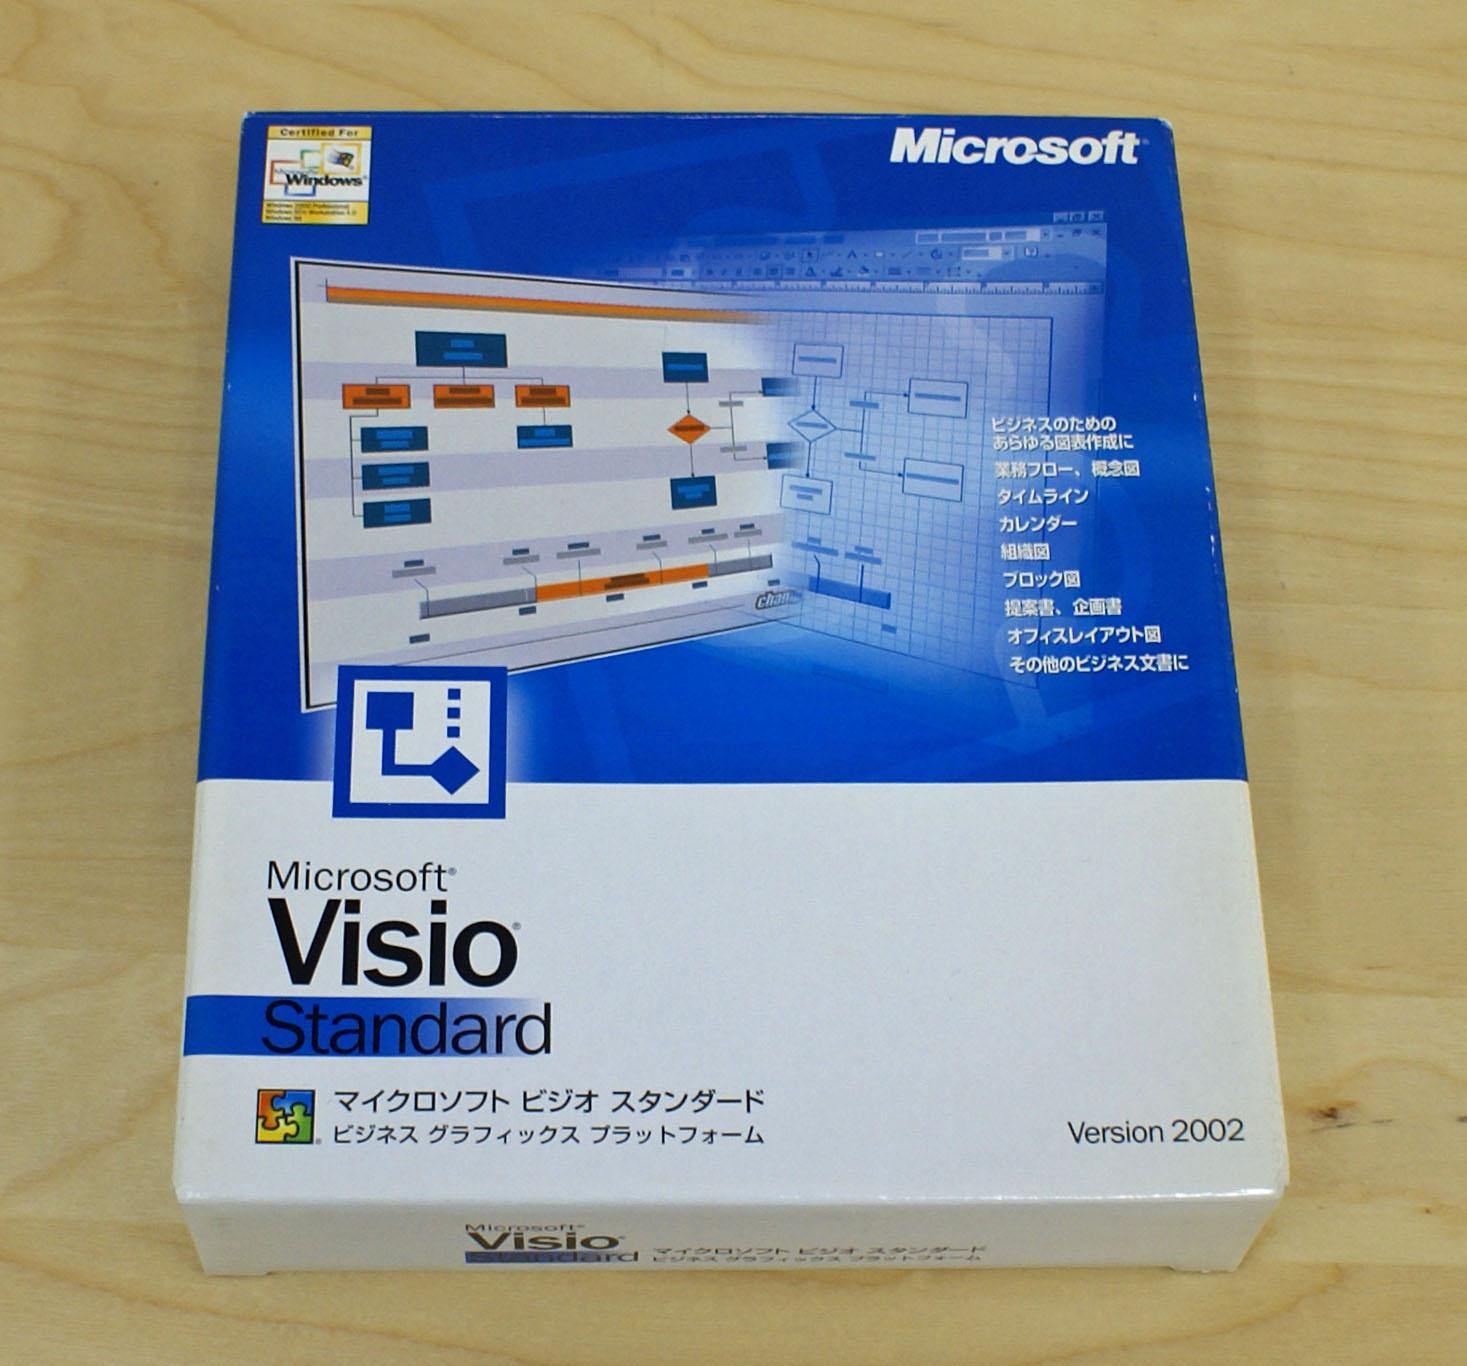 【中古】Microsoft Visio Standard Version 2002